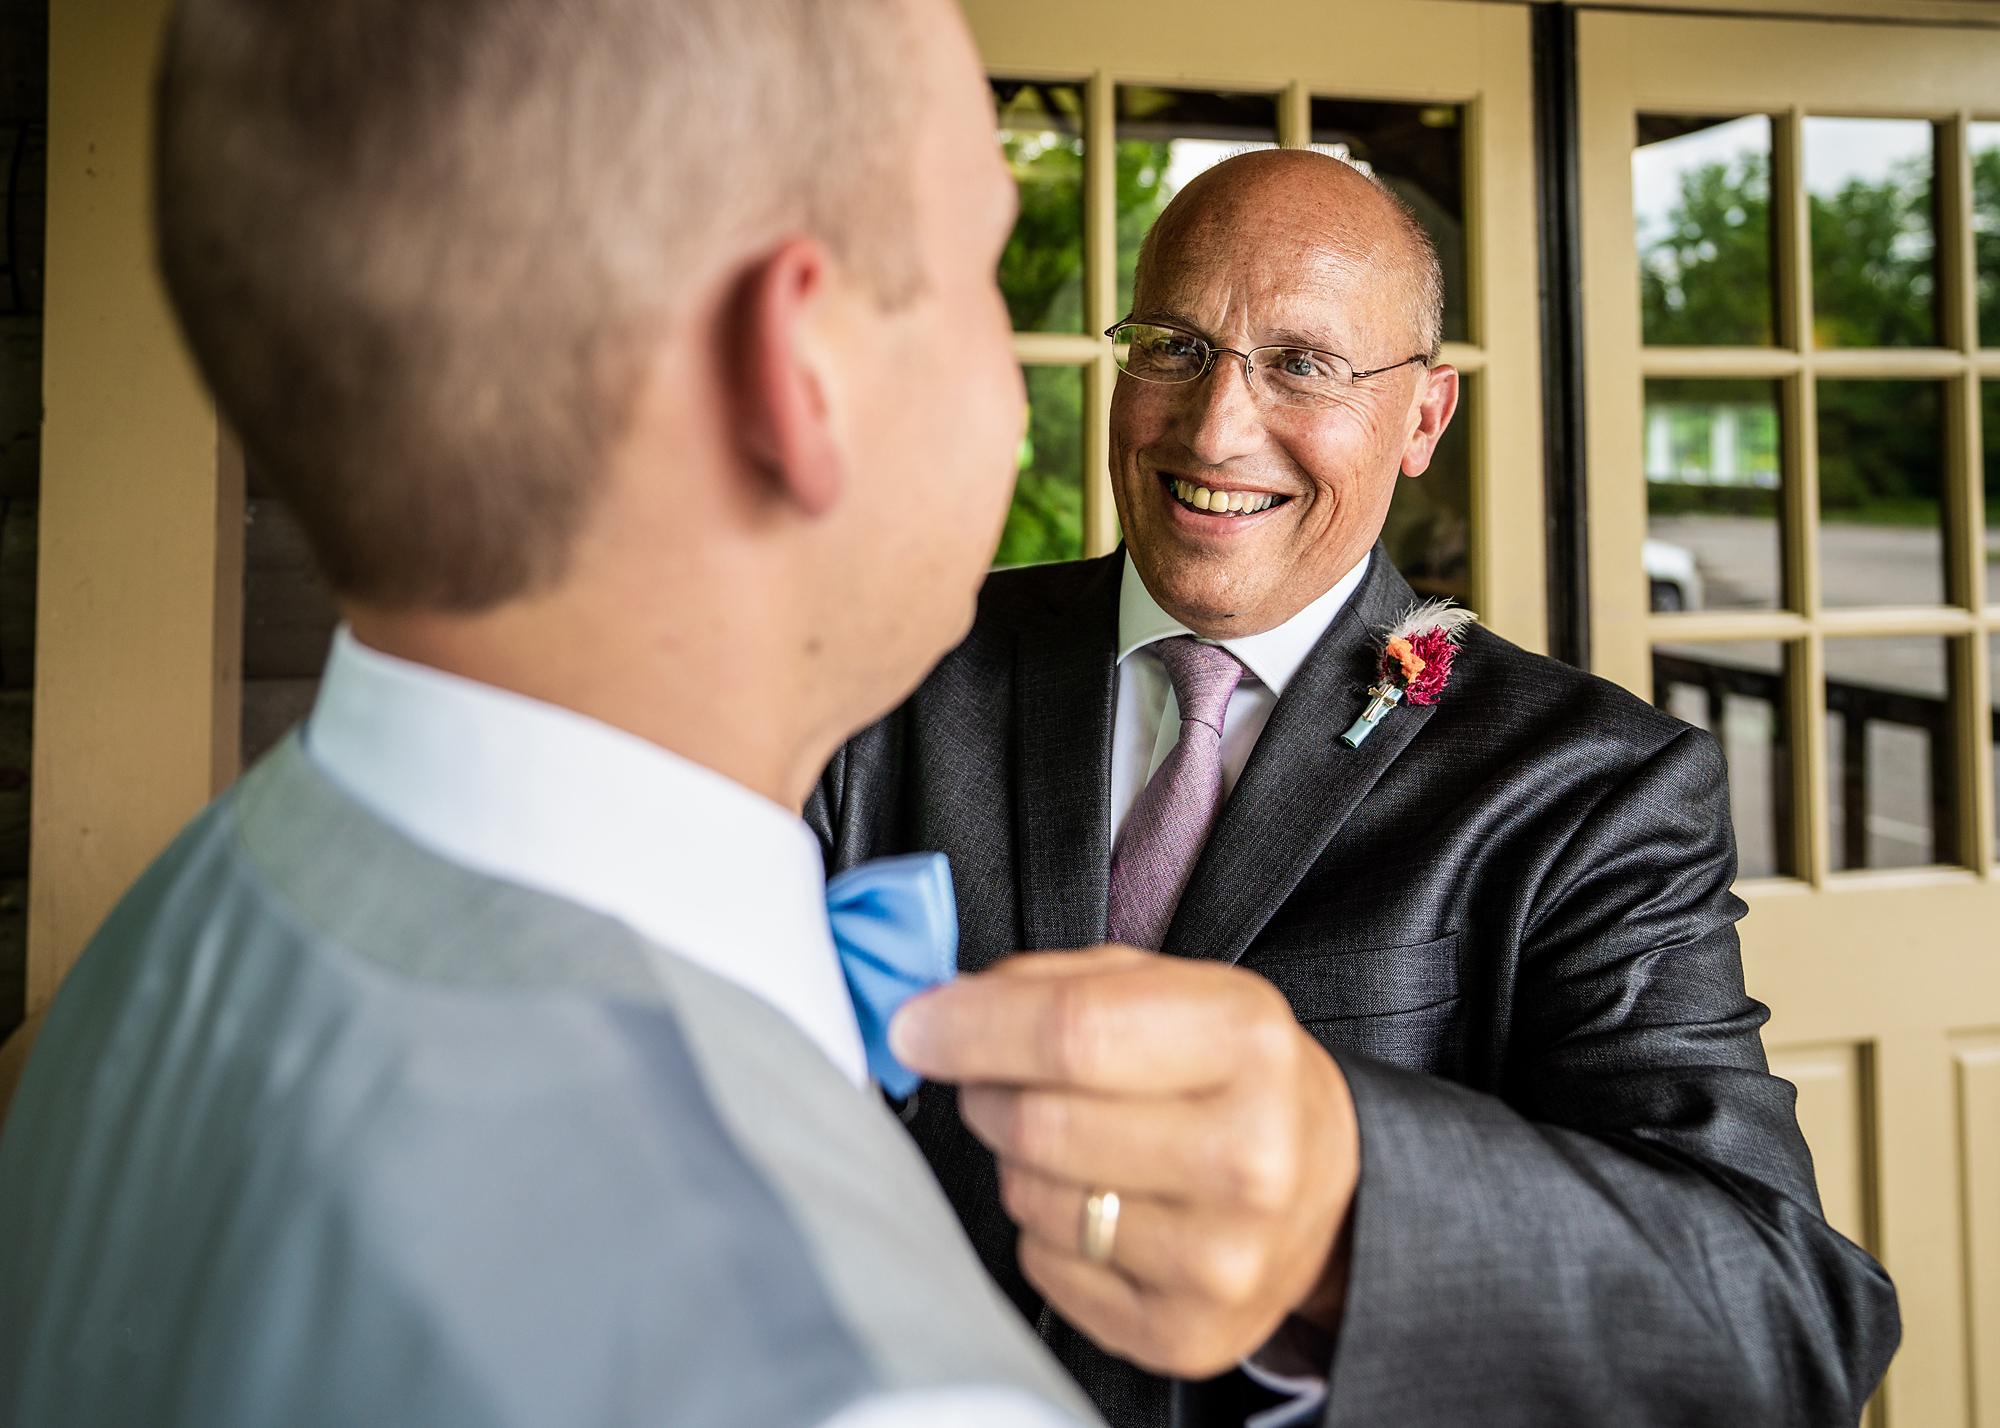 Pattison-Park-Lodge-Wedding-Cincinnati-Ohio-Photographer-13.jpg